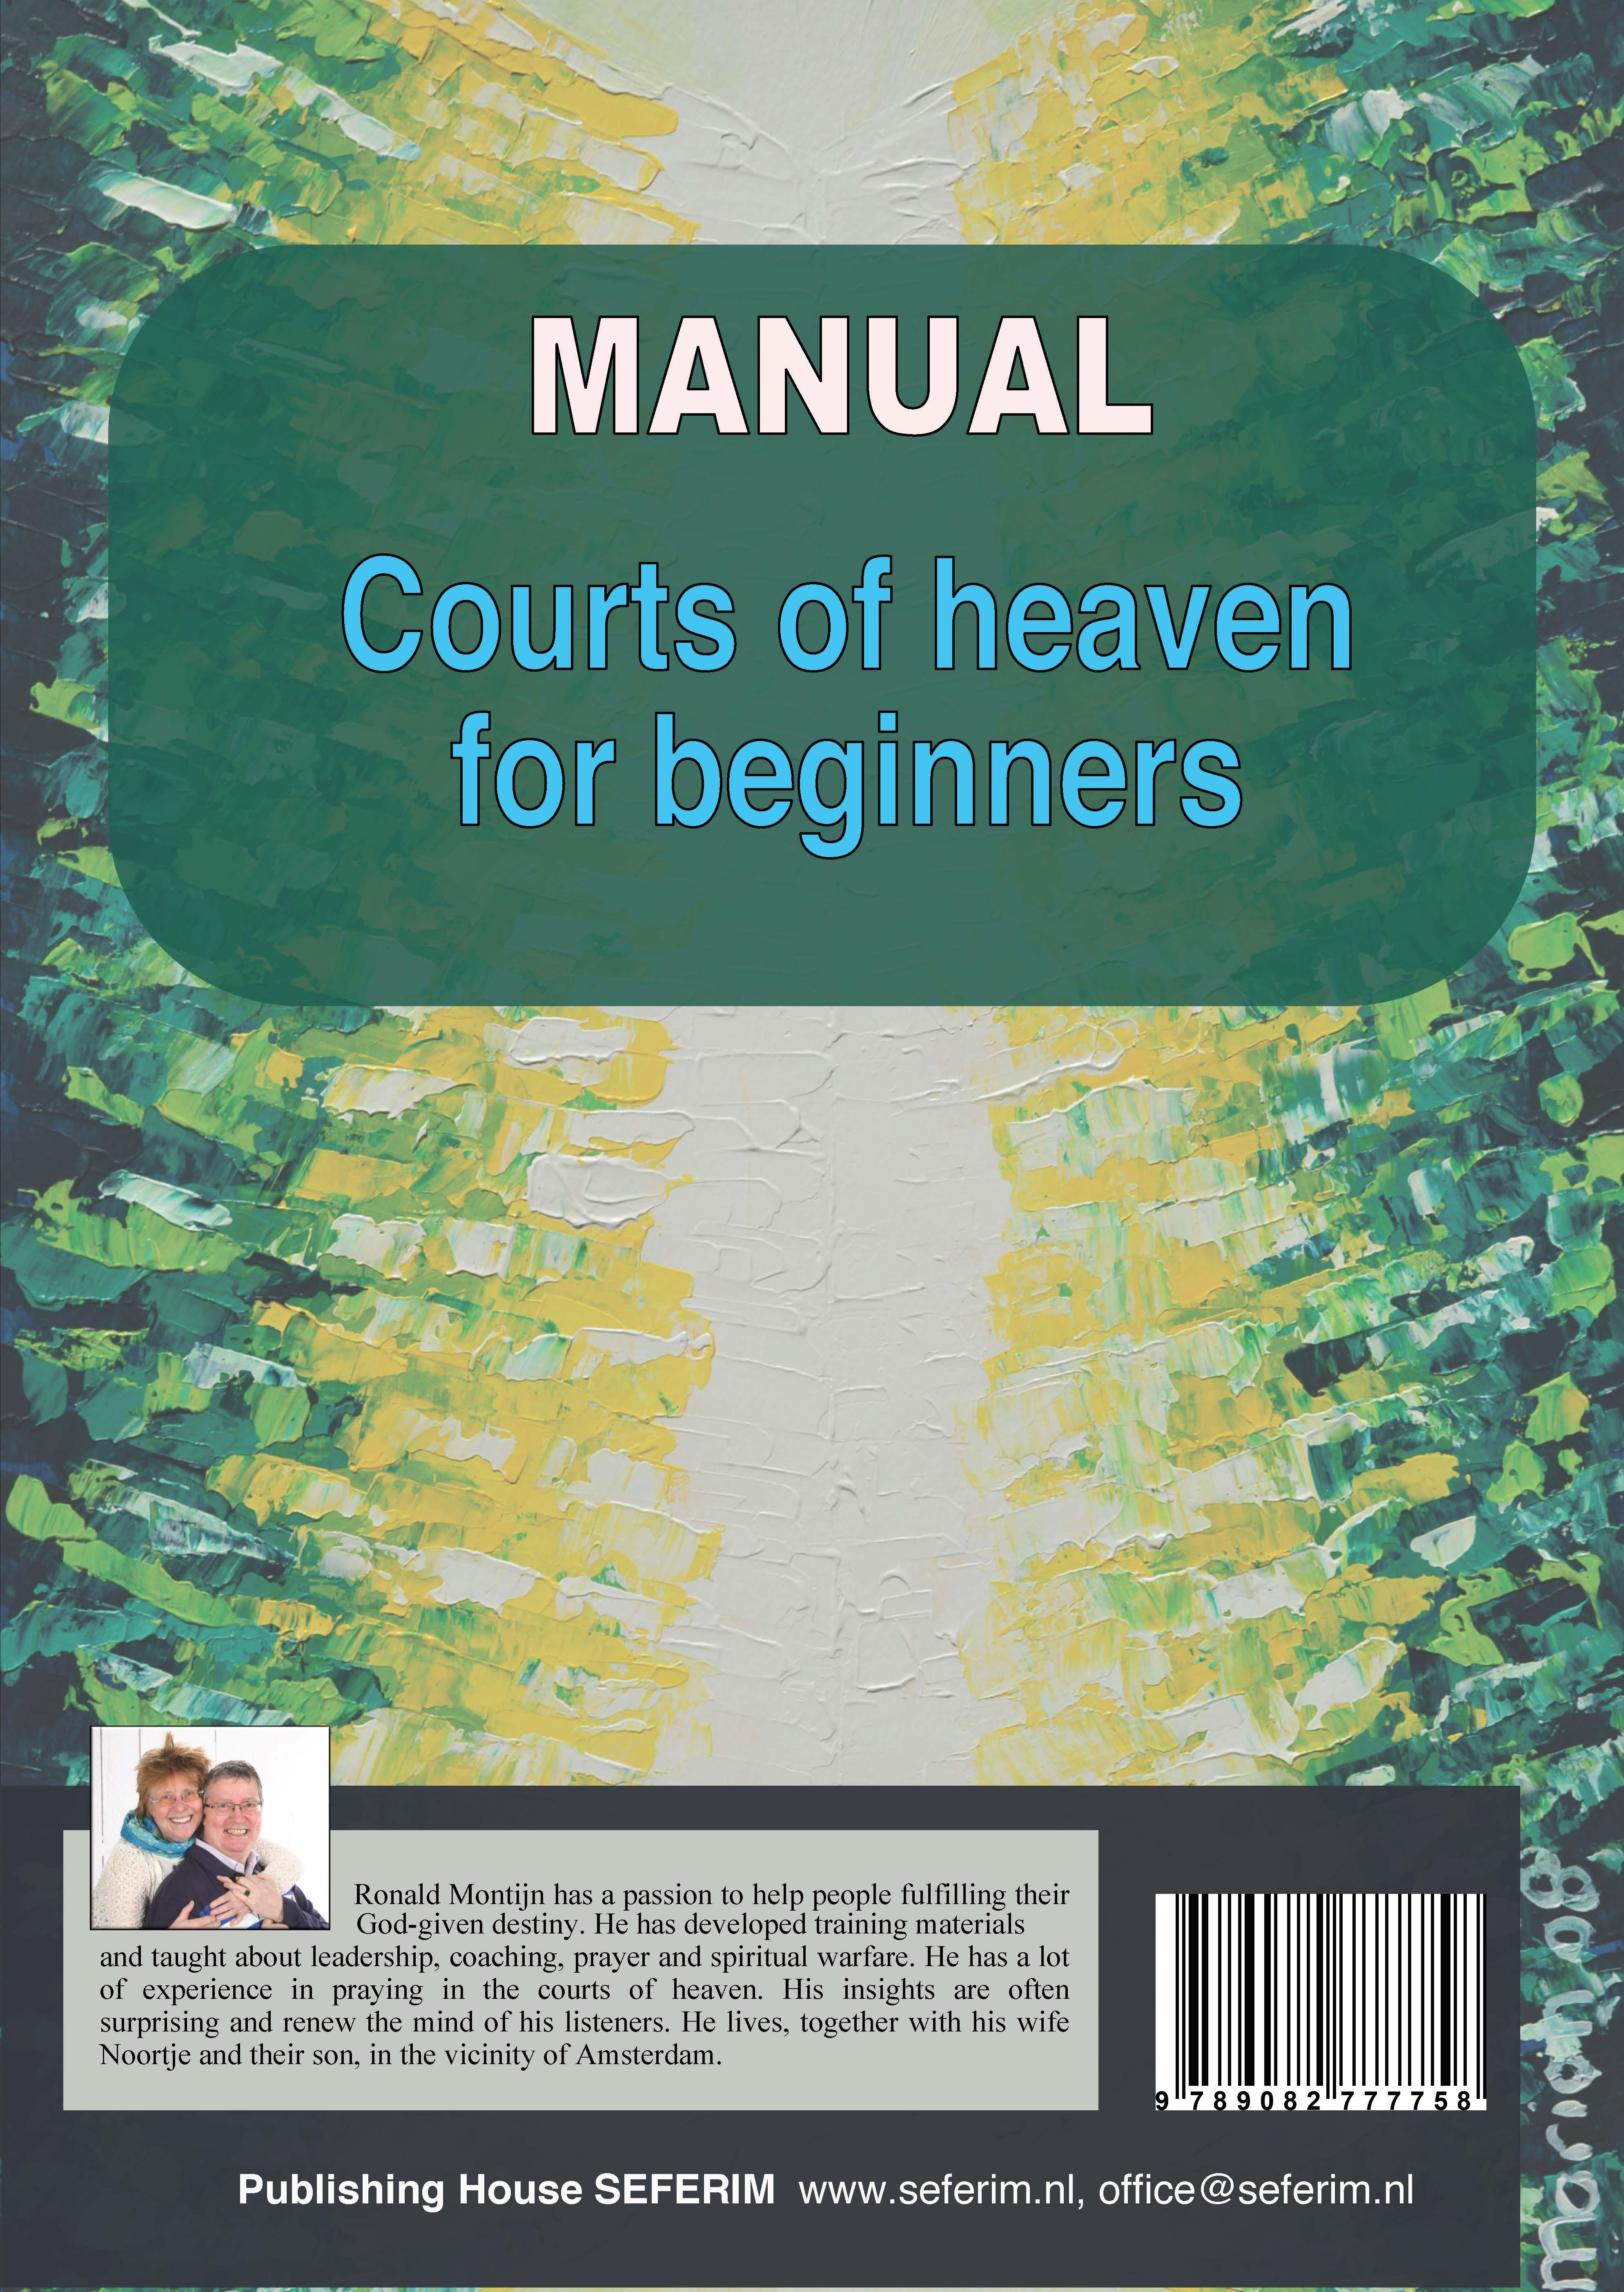 Cover Manual COH V 1.0.0 2019-03-05